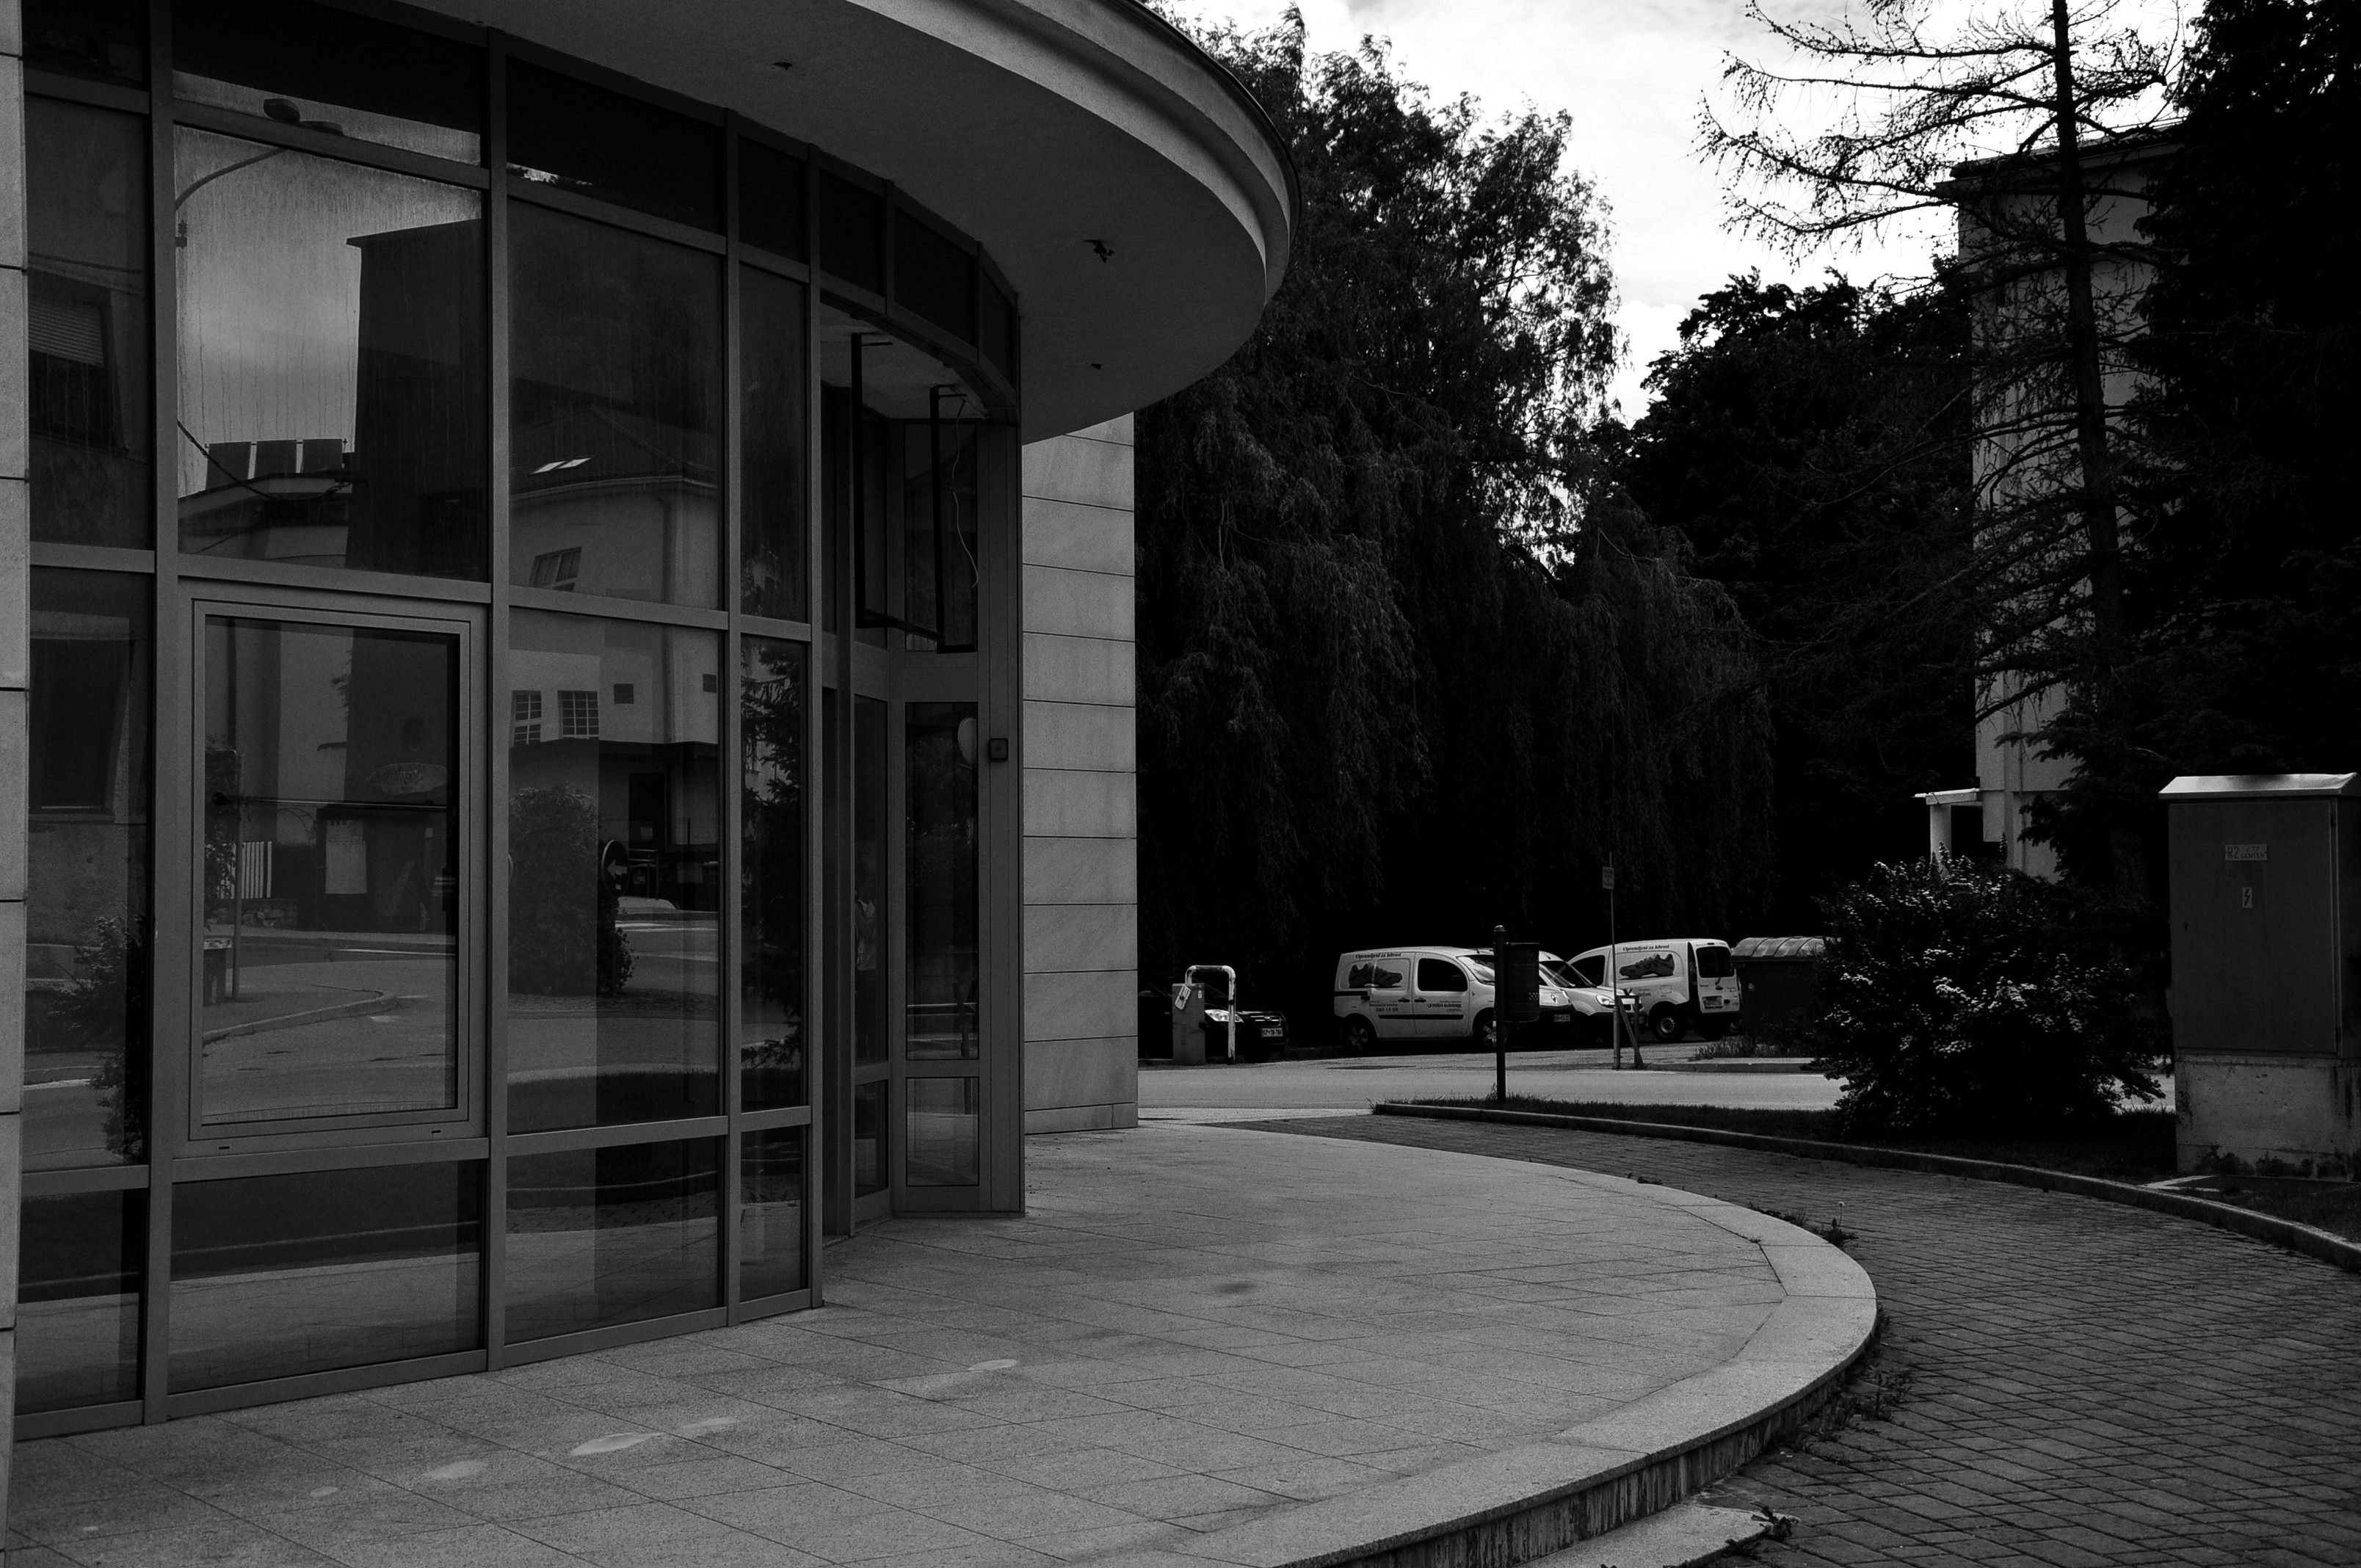 Urban black & white photography.